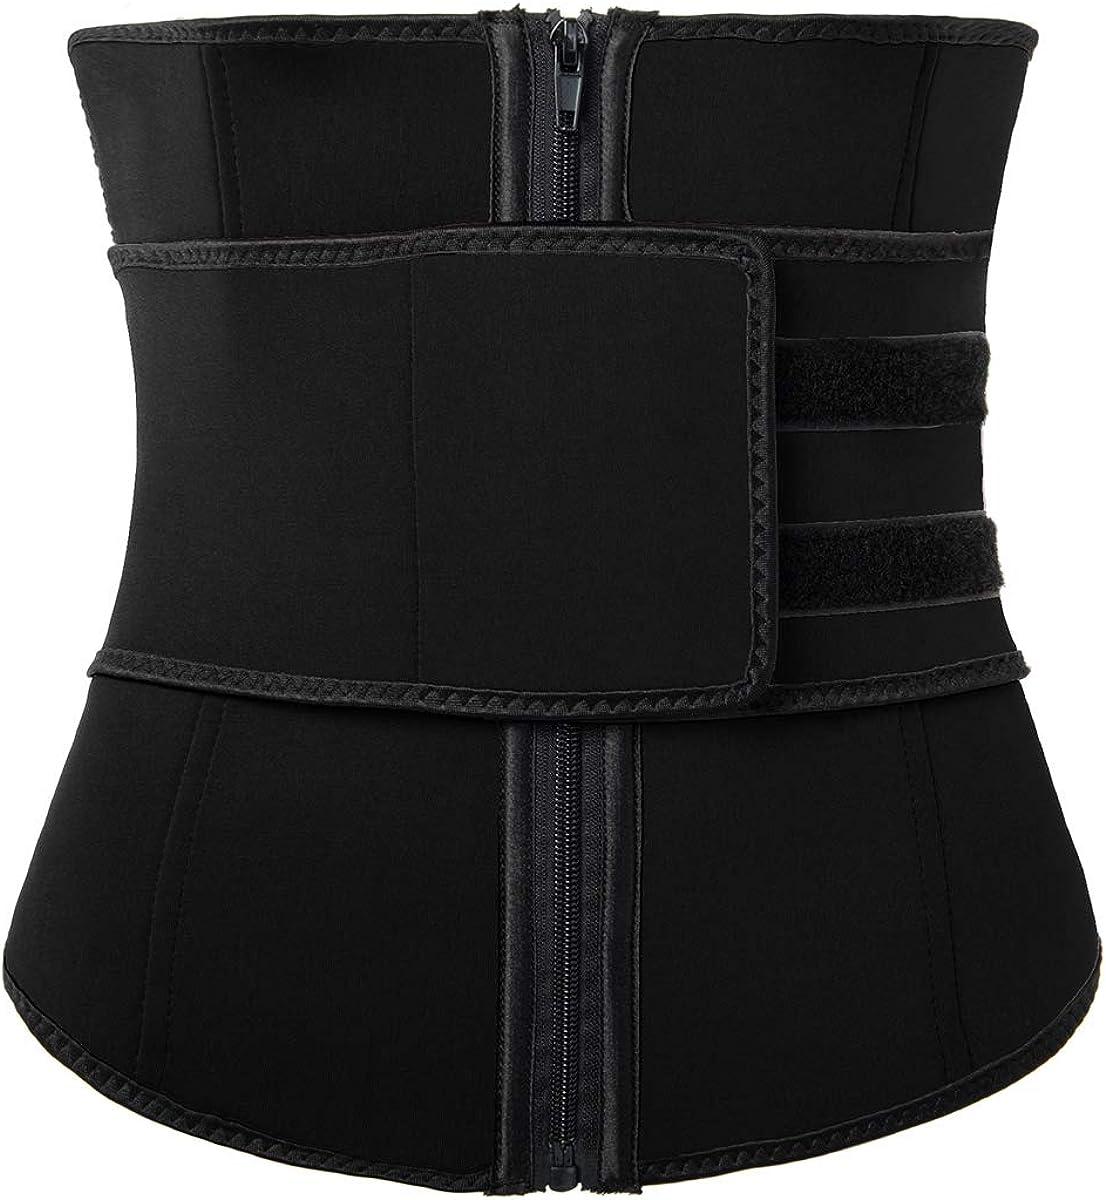 Hot Sweat Neoprene Sauna Shapers Slimming Belt Waist Cincher Girdle for Weight Loss Women /& Men With Zipper